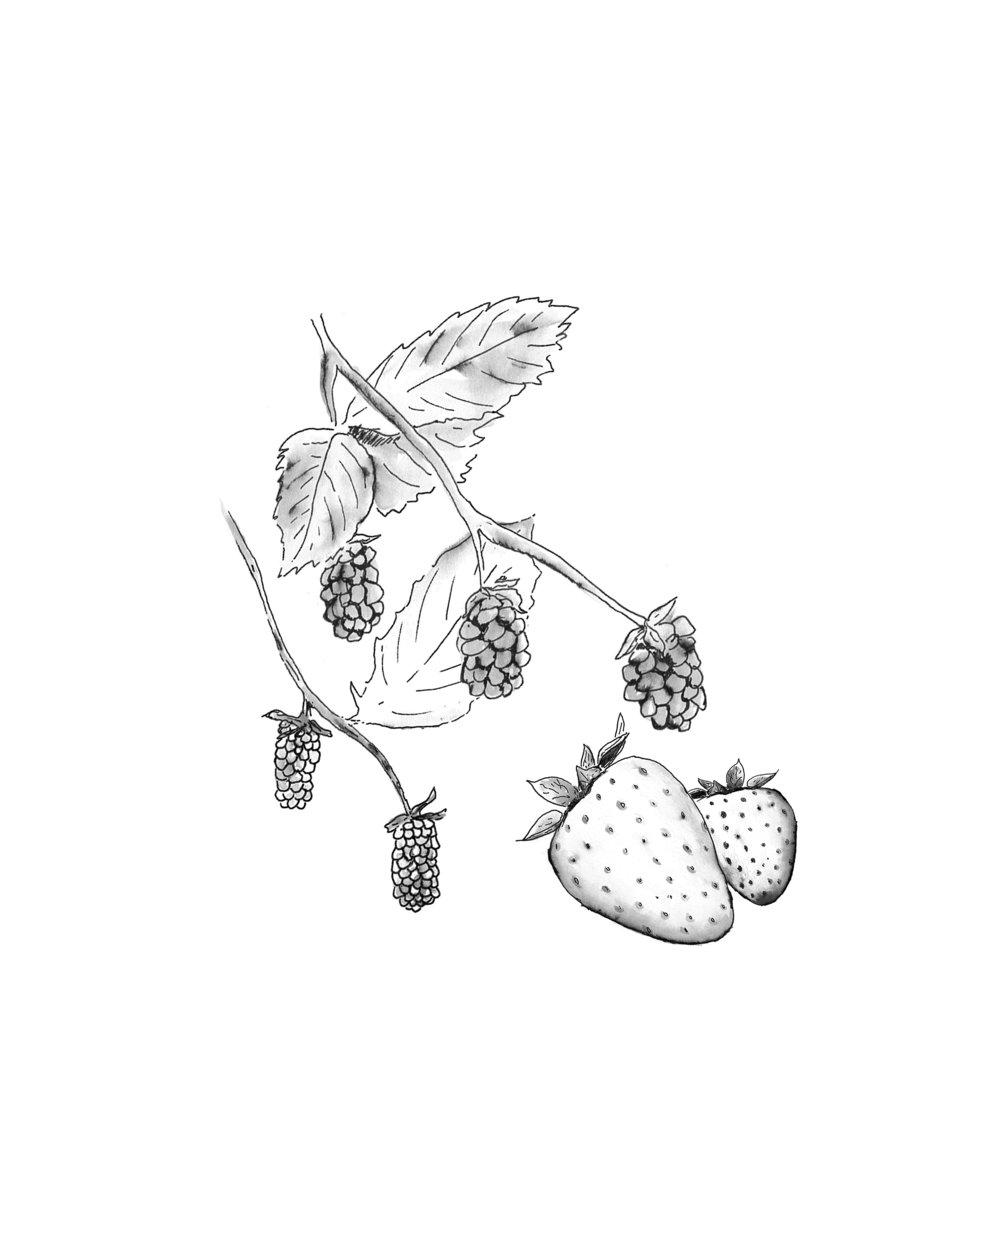 Loganberries, Olallieberries, and Strawberries